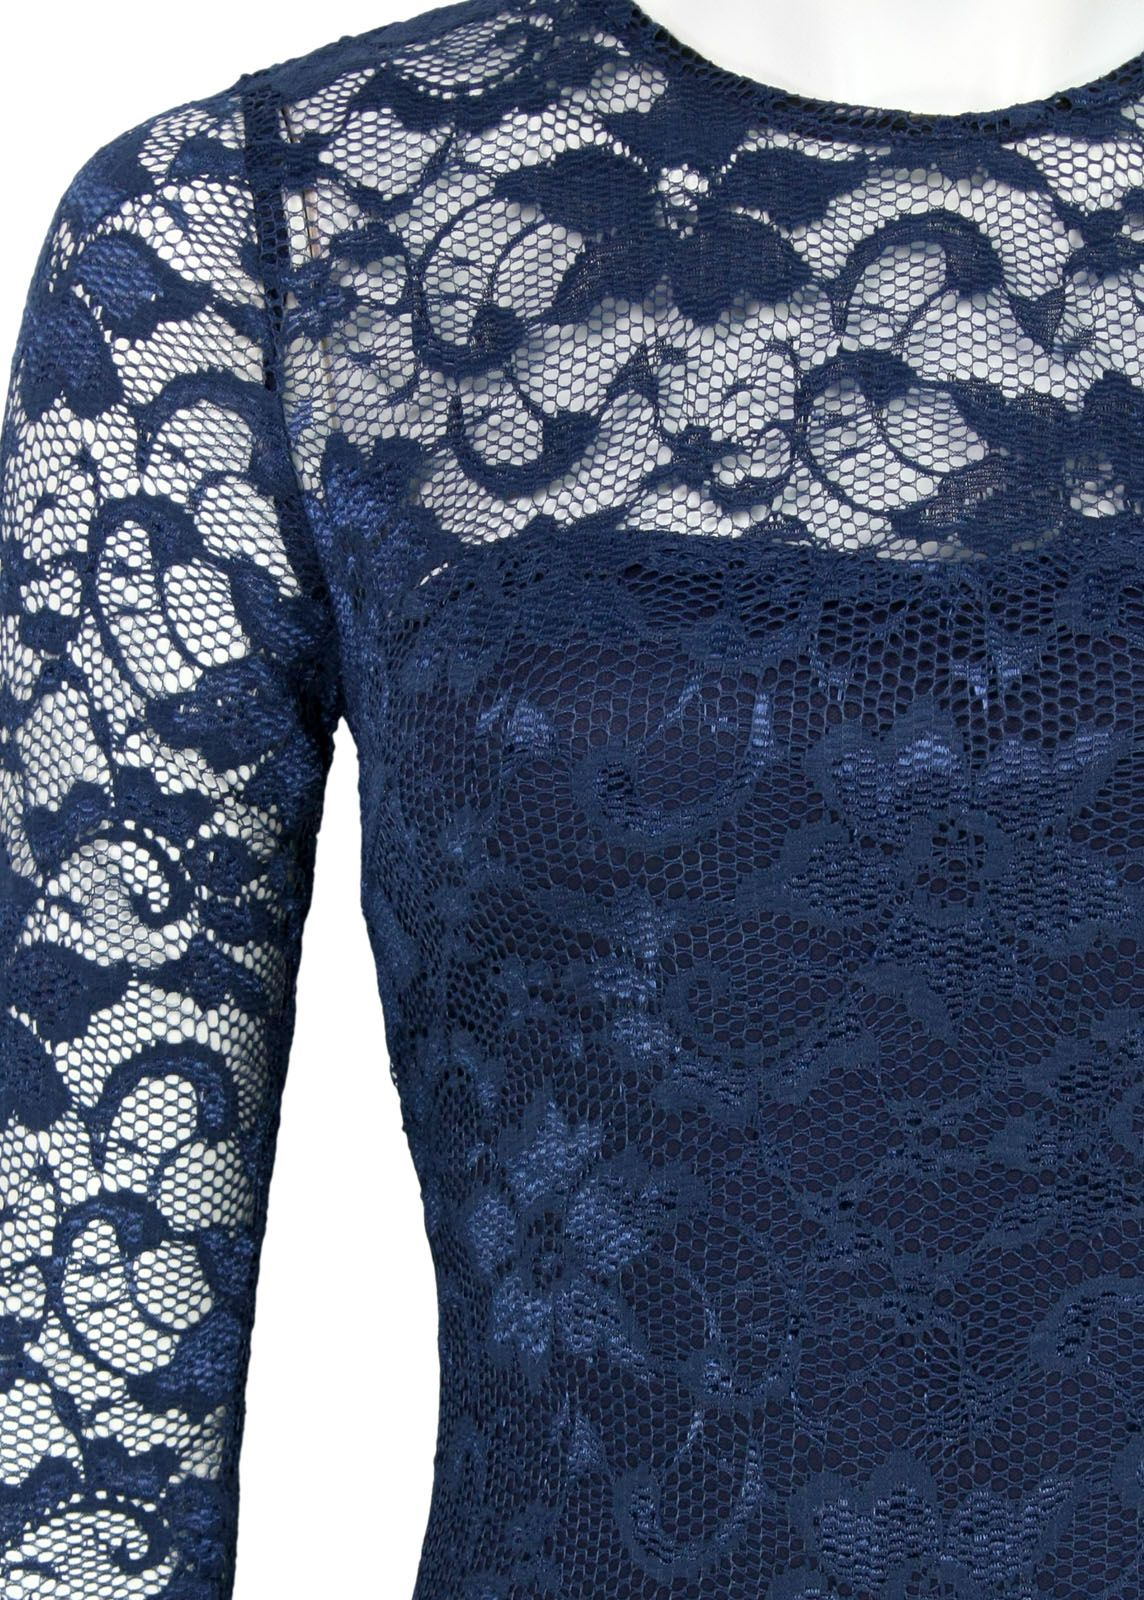 AX Paris Spitzenkleid Blau - fettebeute Online Shop